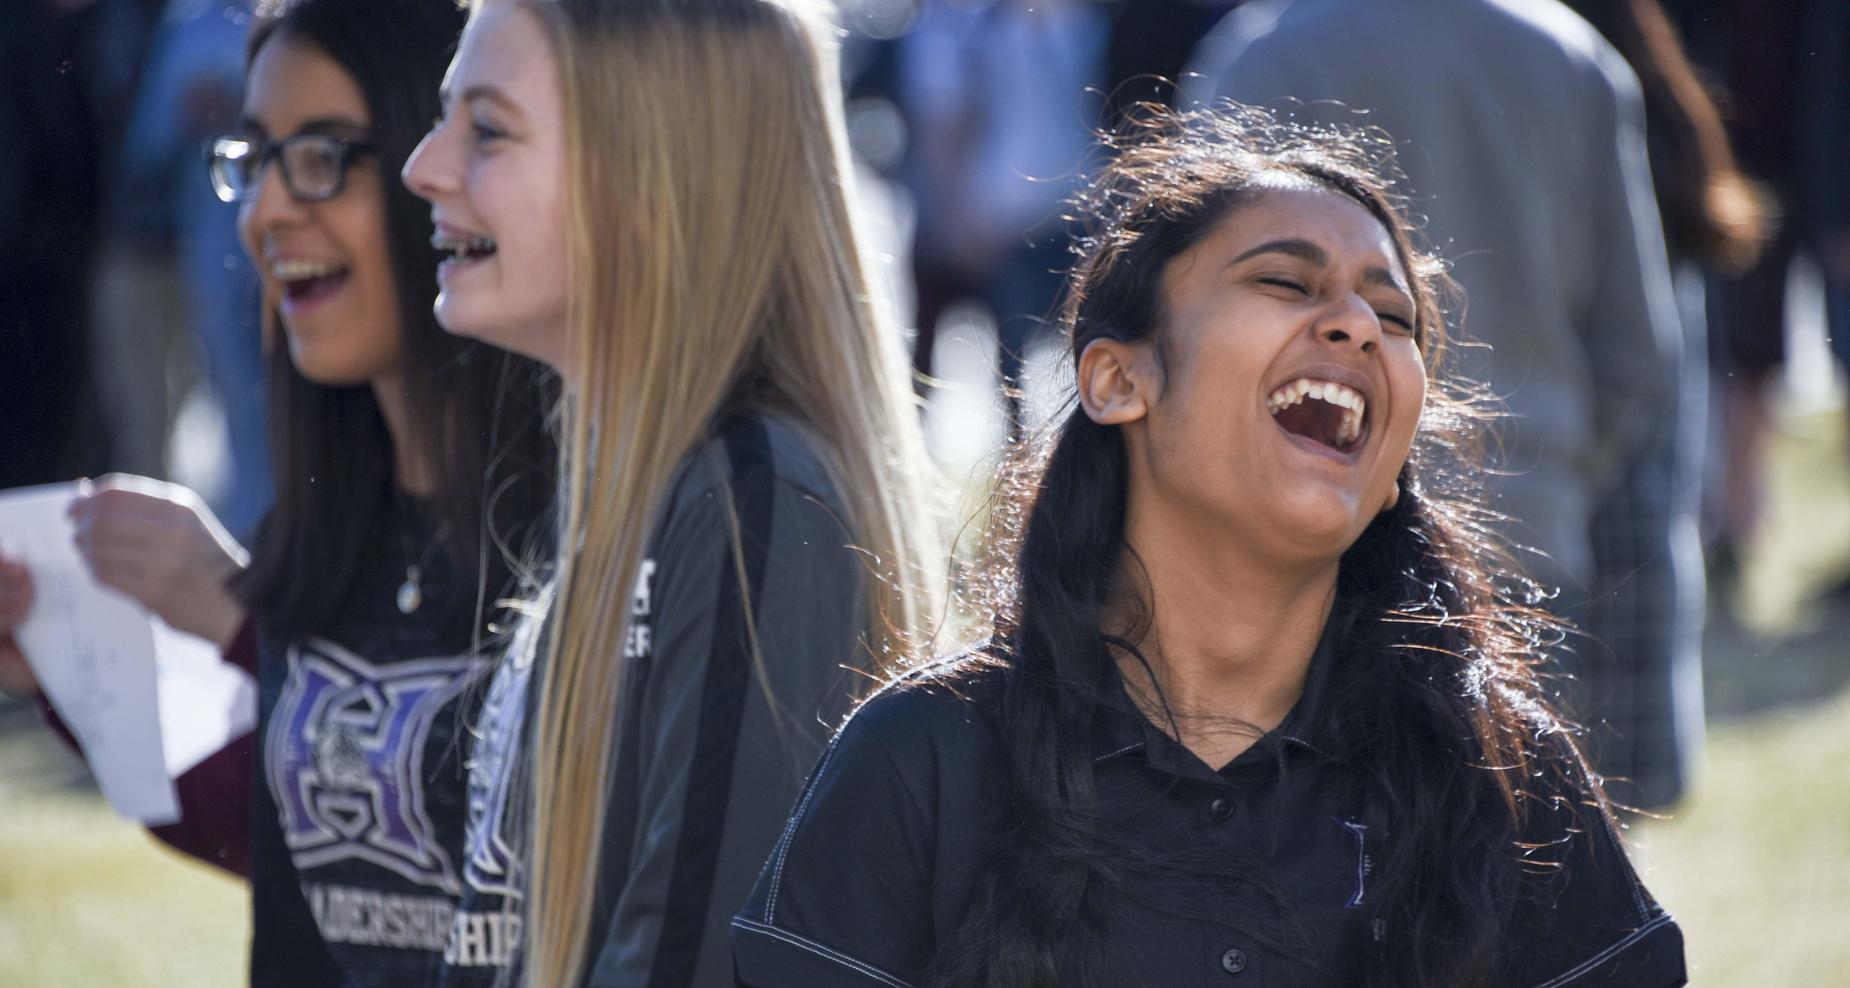 high school girls laughing